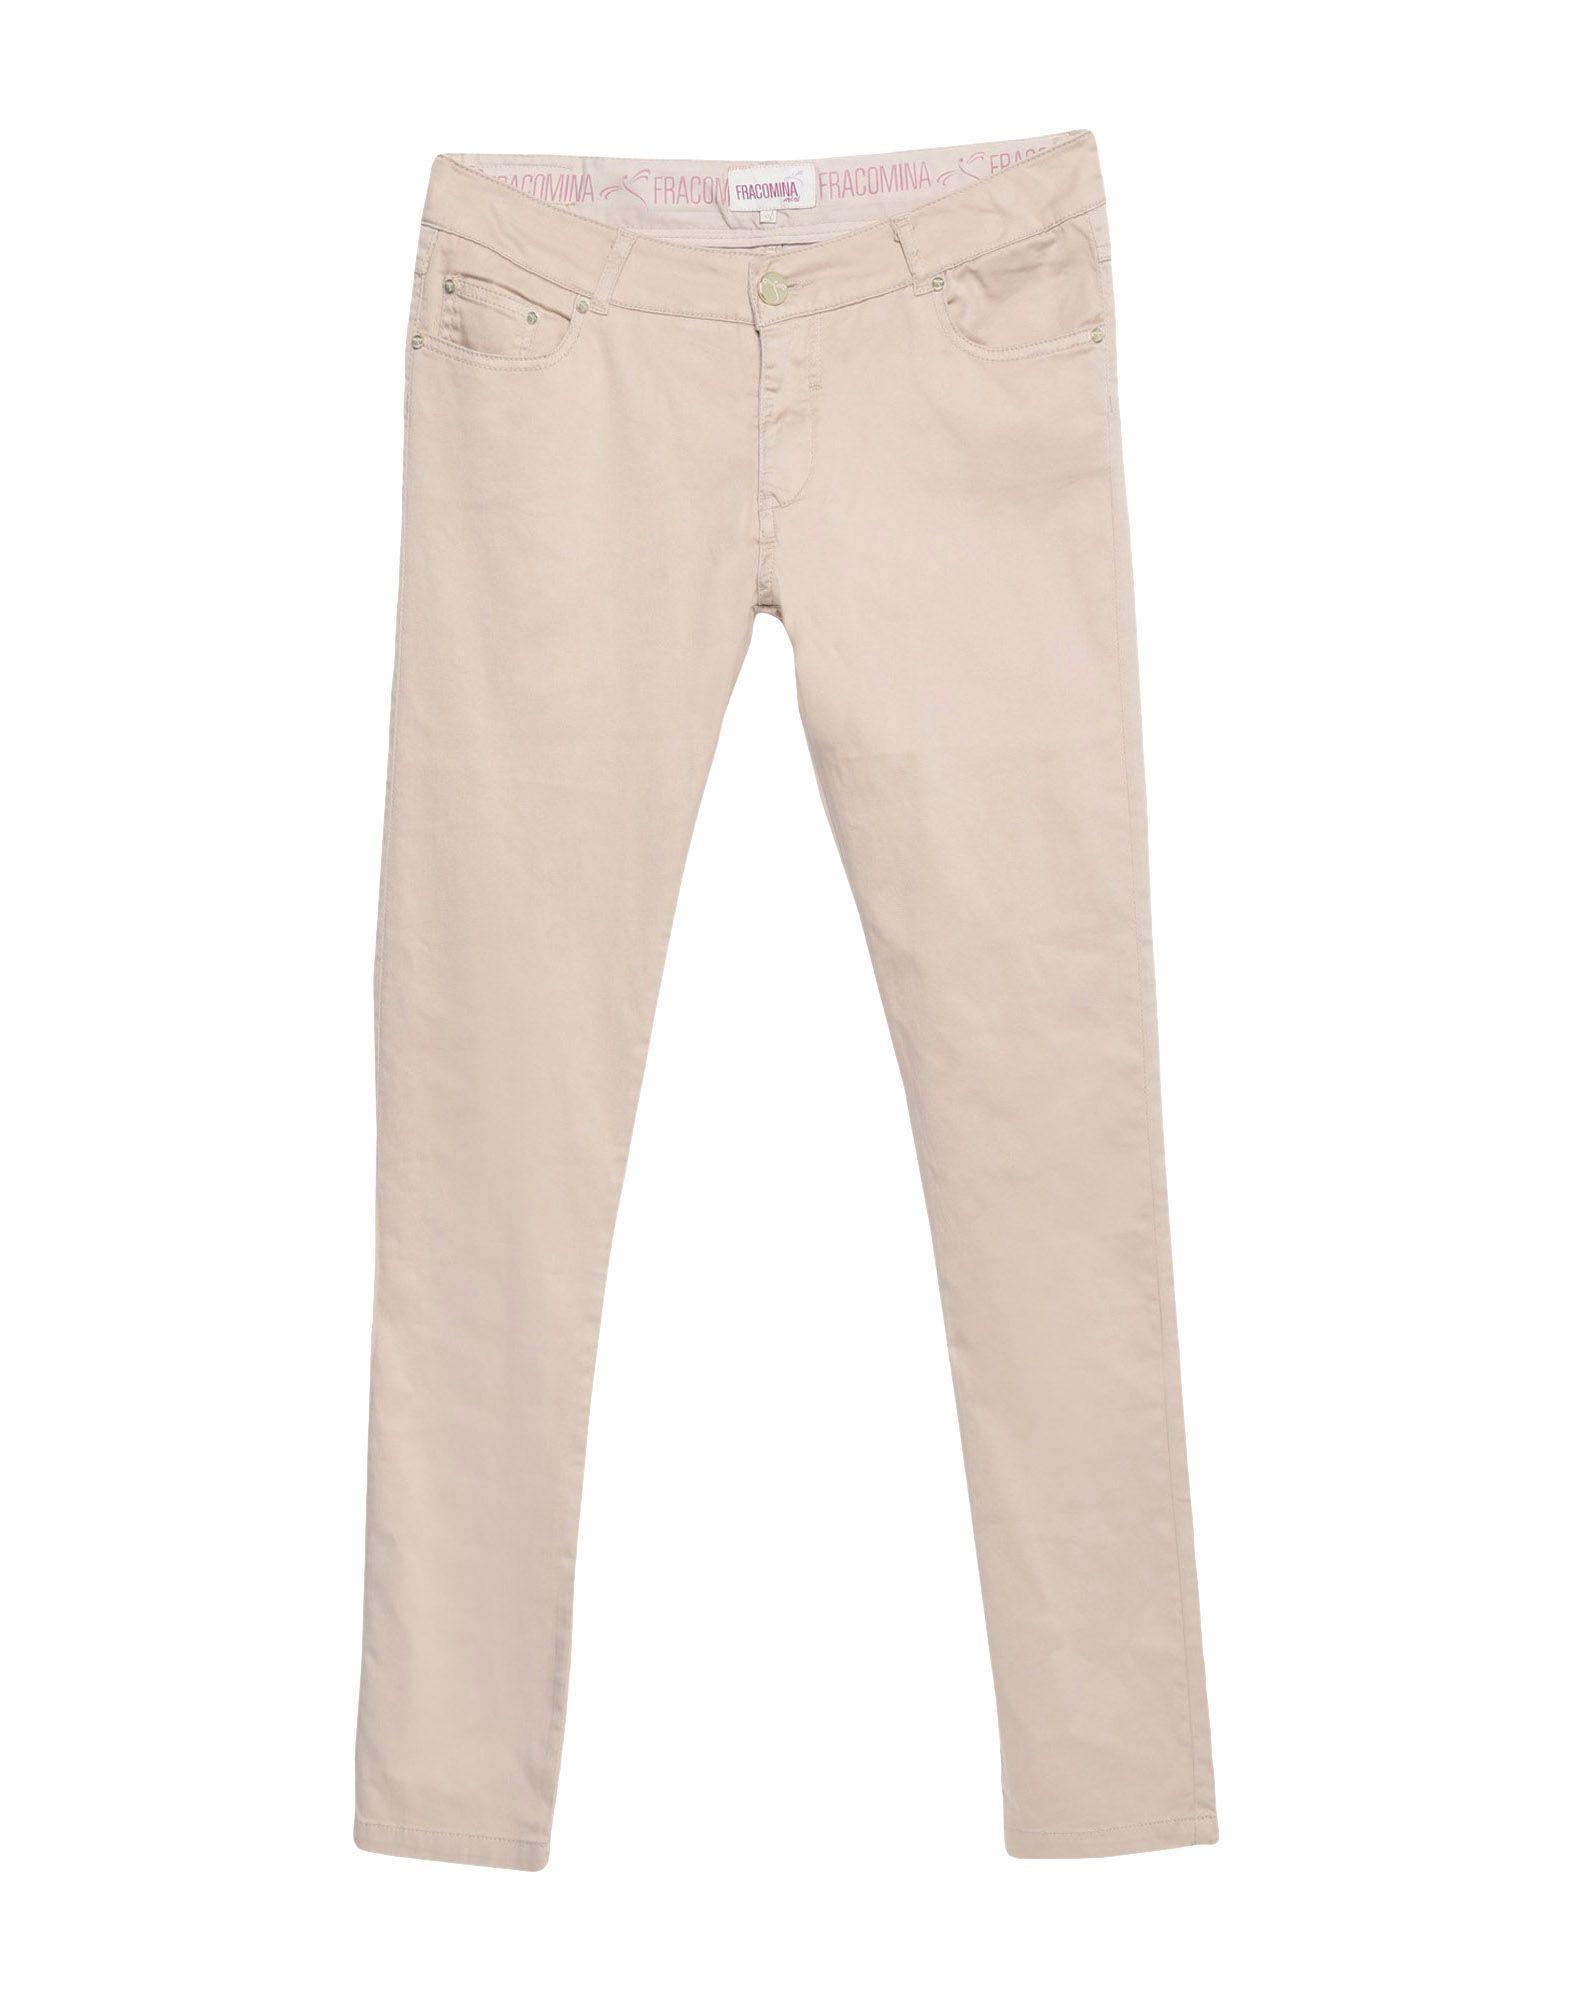 FRACOMINA MINI Повседневные брюки